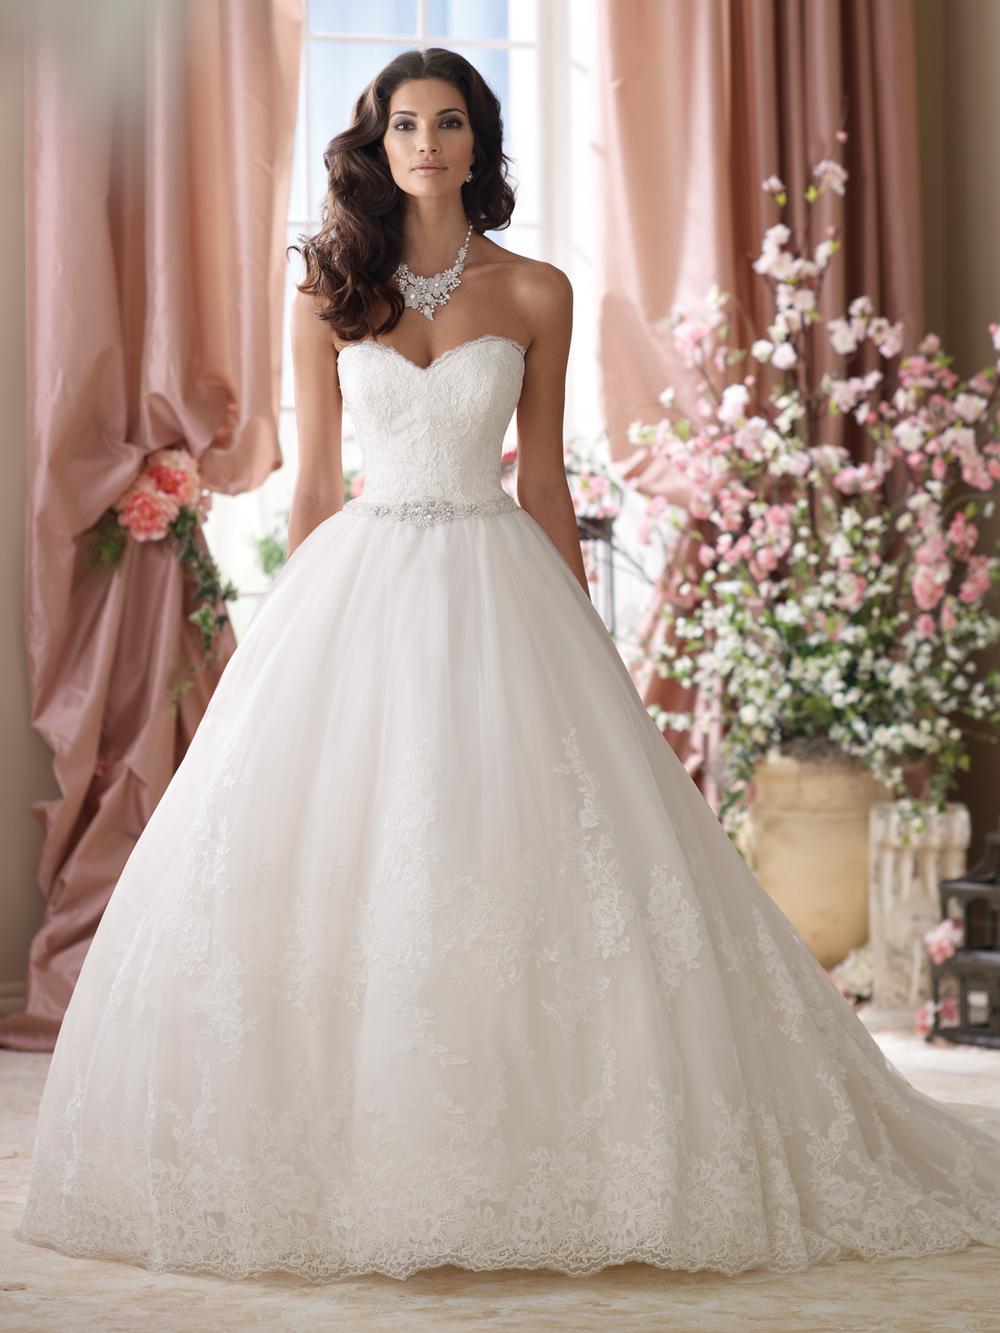 114289_wedding_dresses_20141.jpg